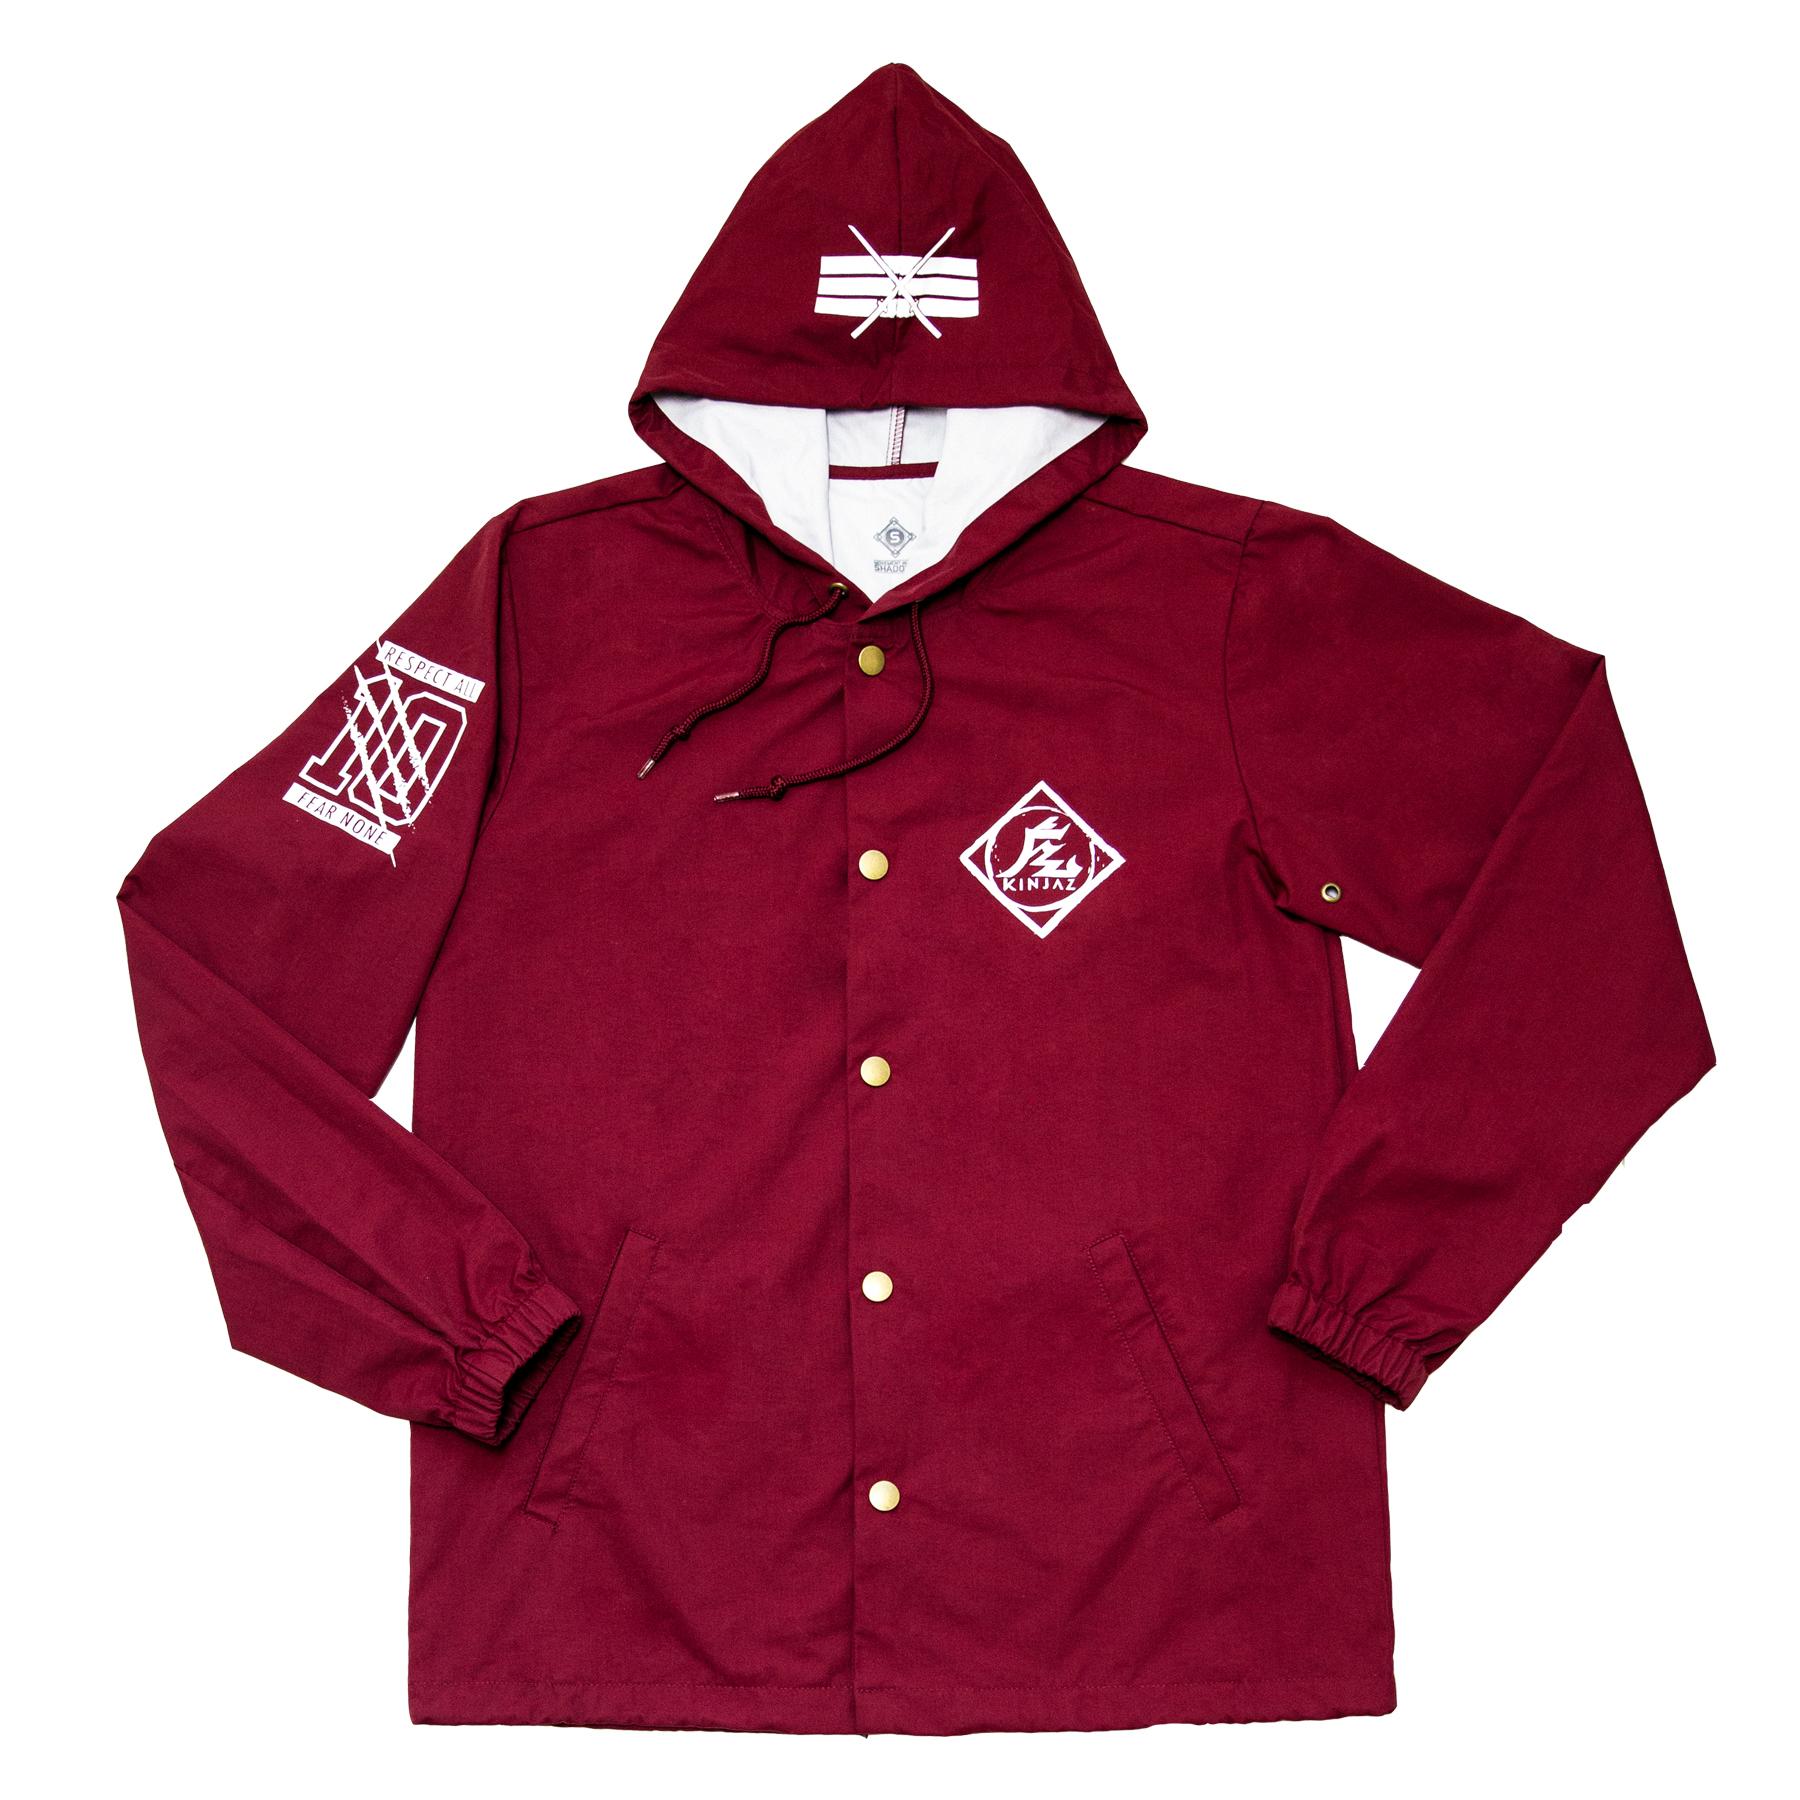 D W quot kin quot koaches jacket maroon kin aesthetik